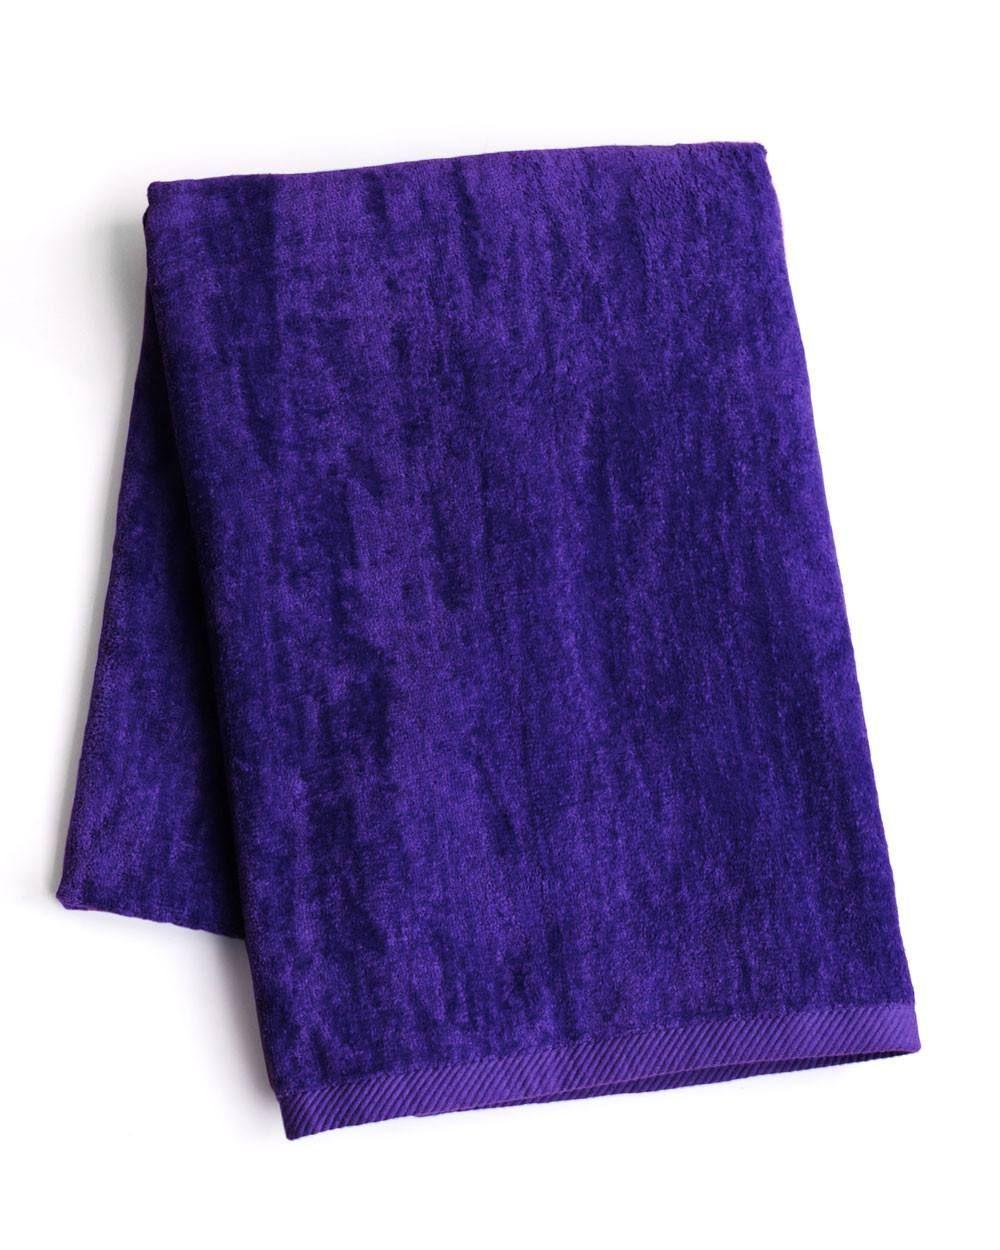 Bora Bora Egyptian Cotton Resort Beach Towel Collection